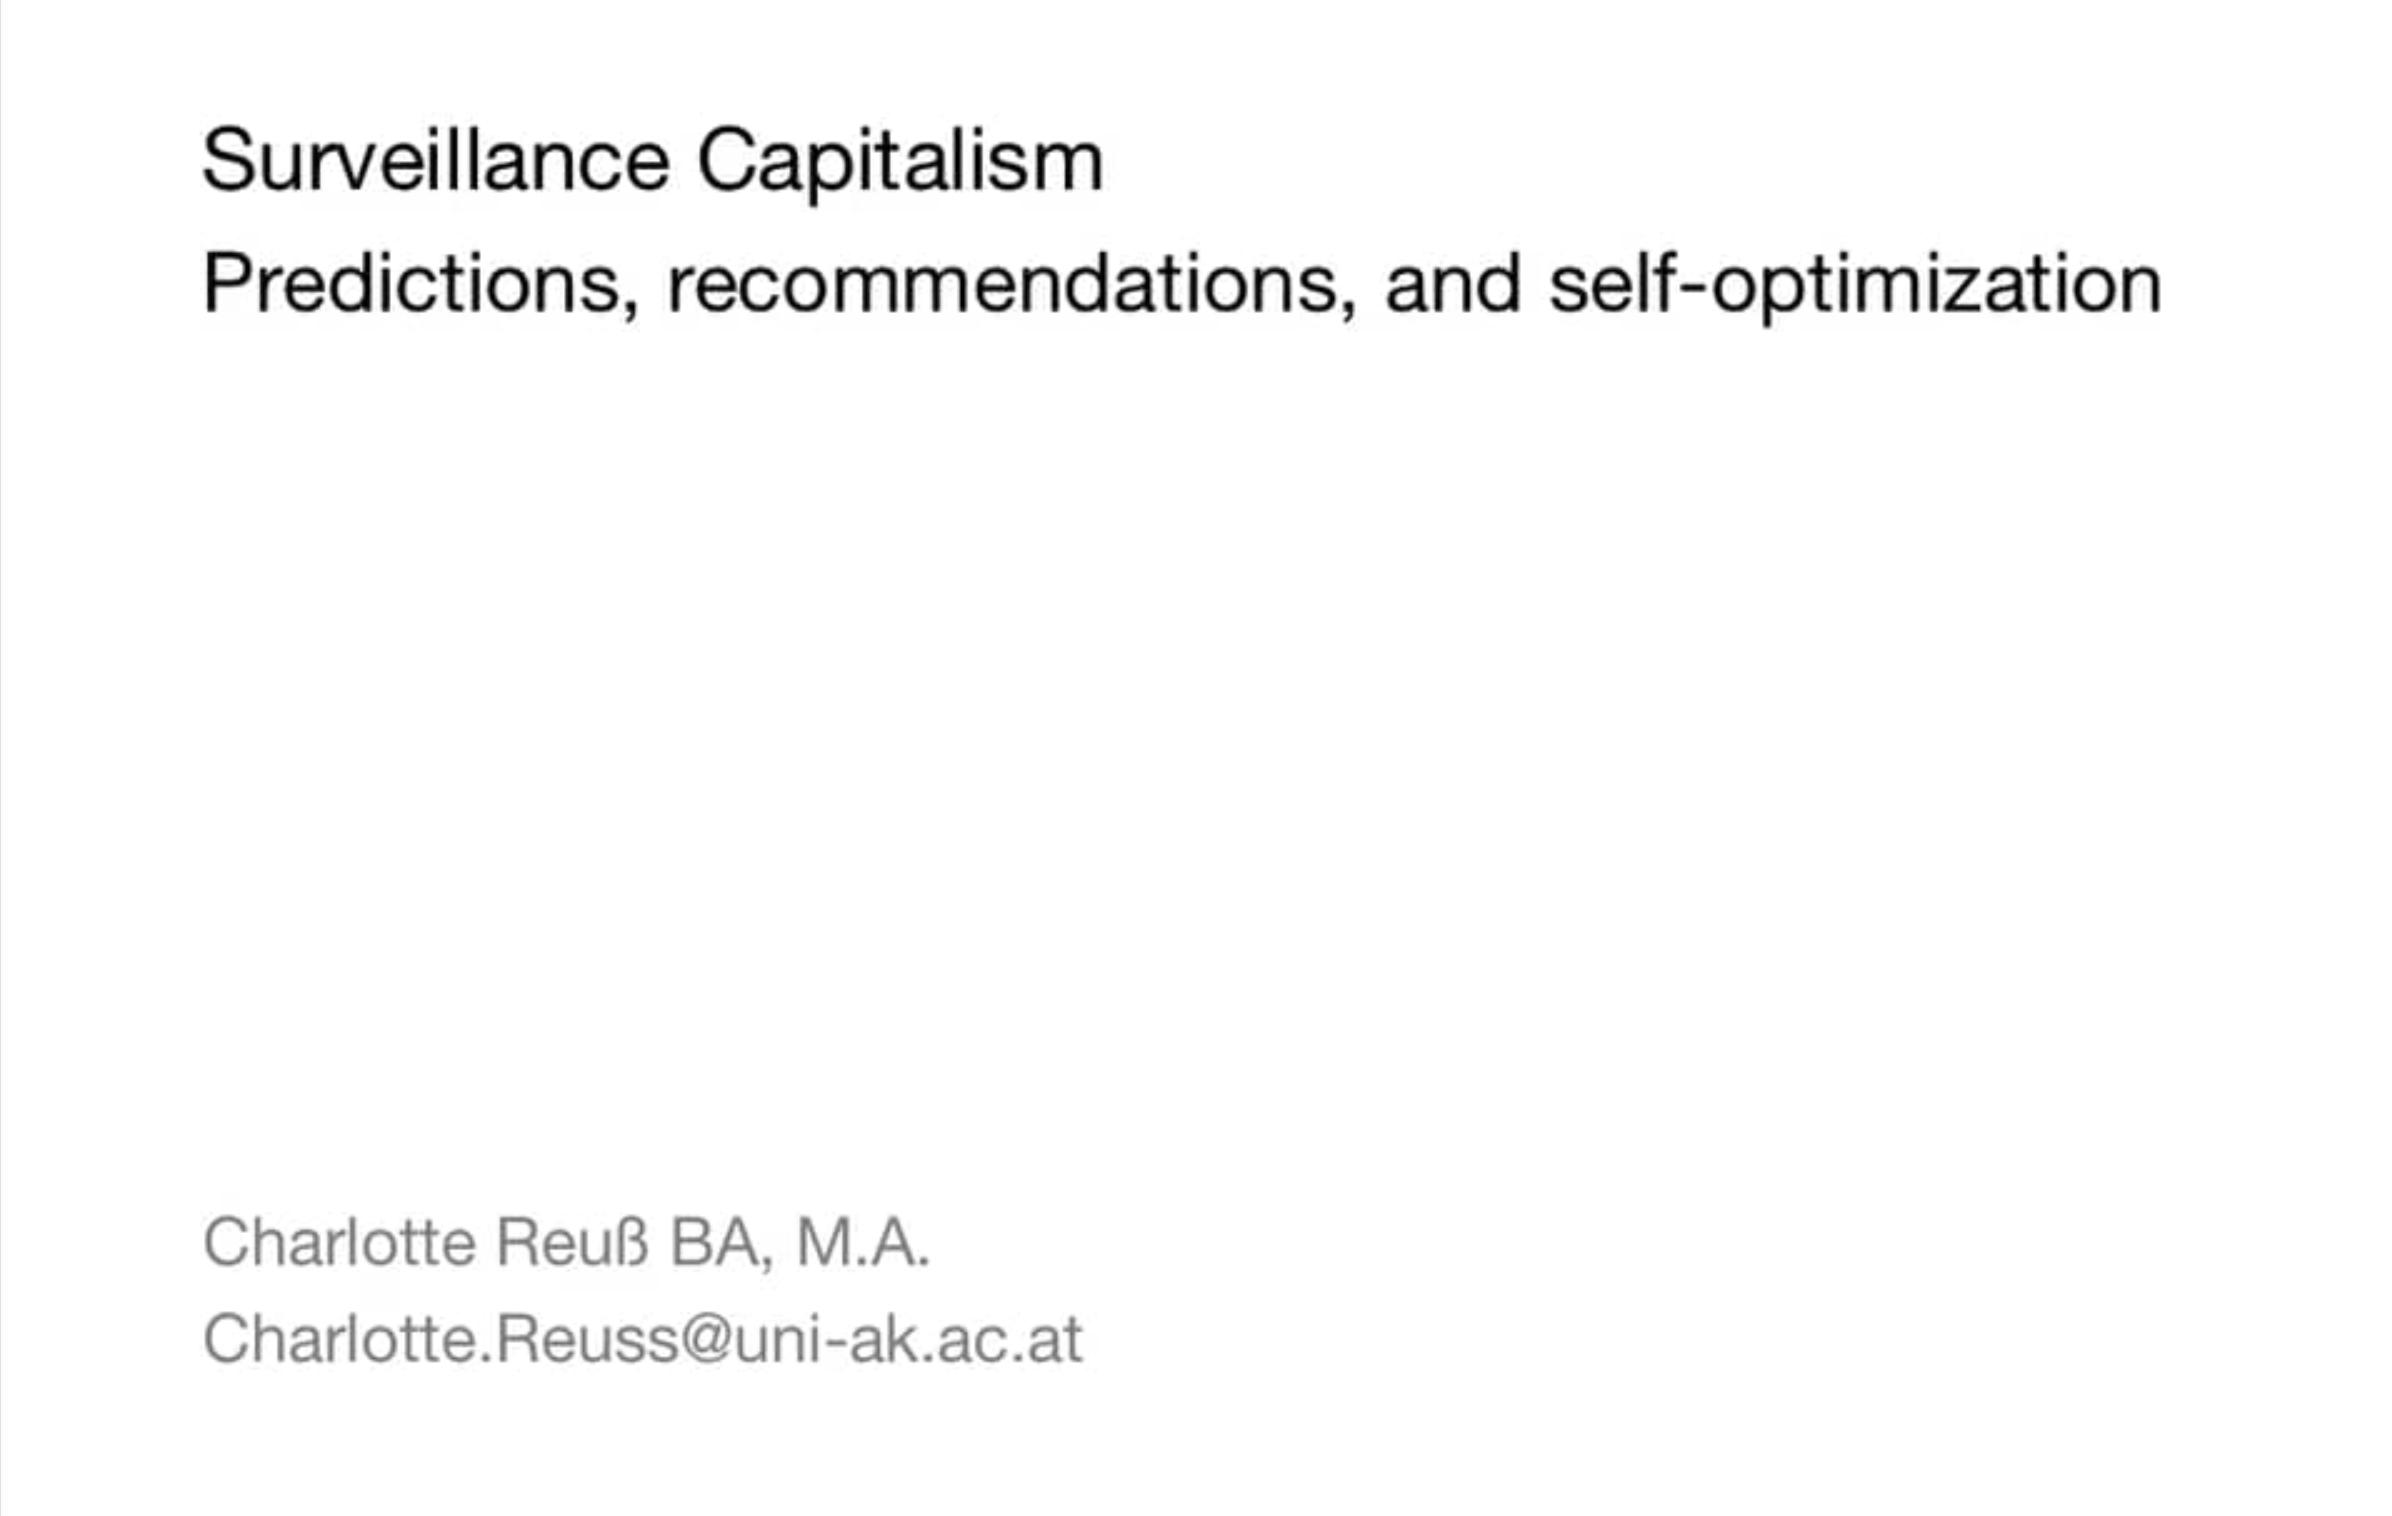 Charlotte Reuss Surveillance Capitalism